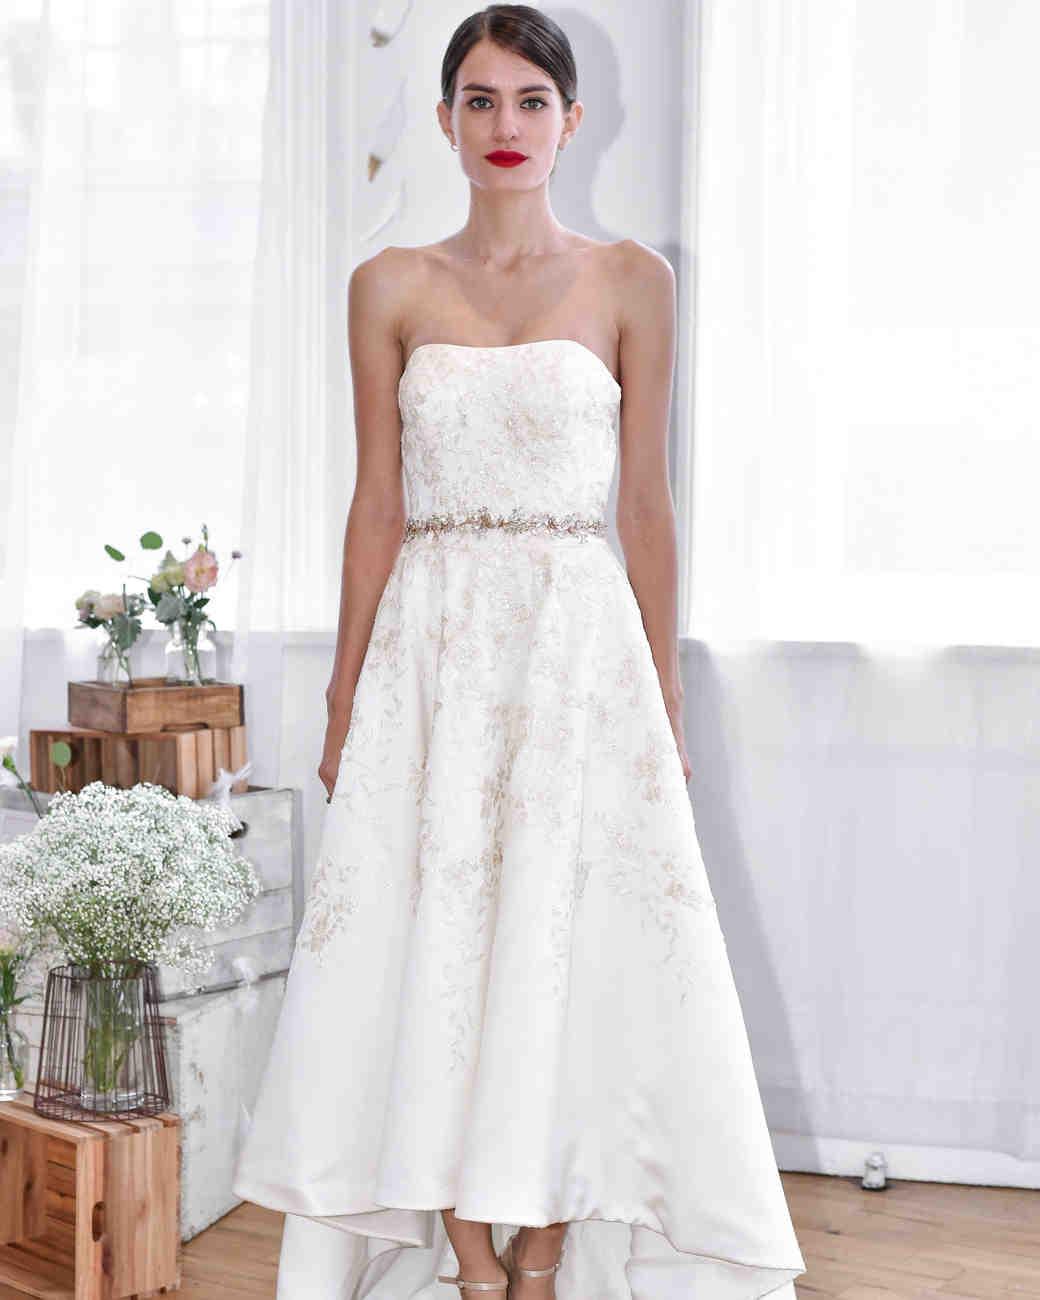 david's bridal fall 2018 strapless a-line wedding dress